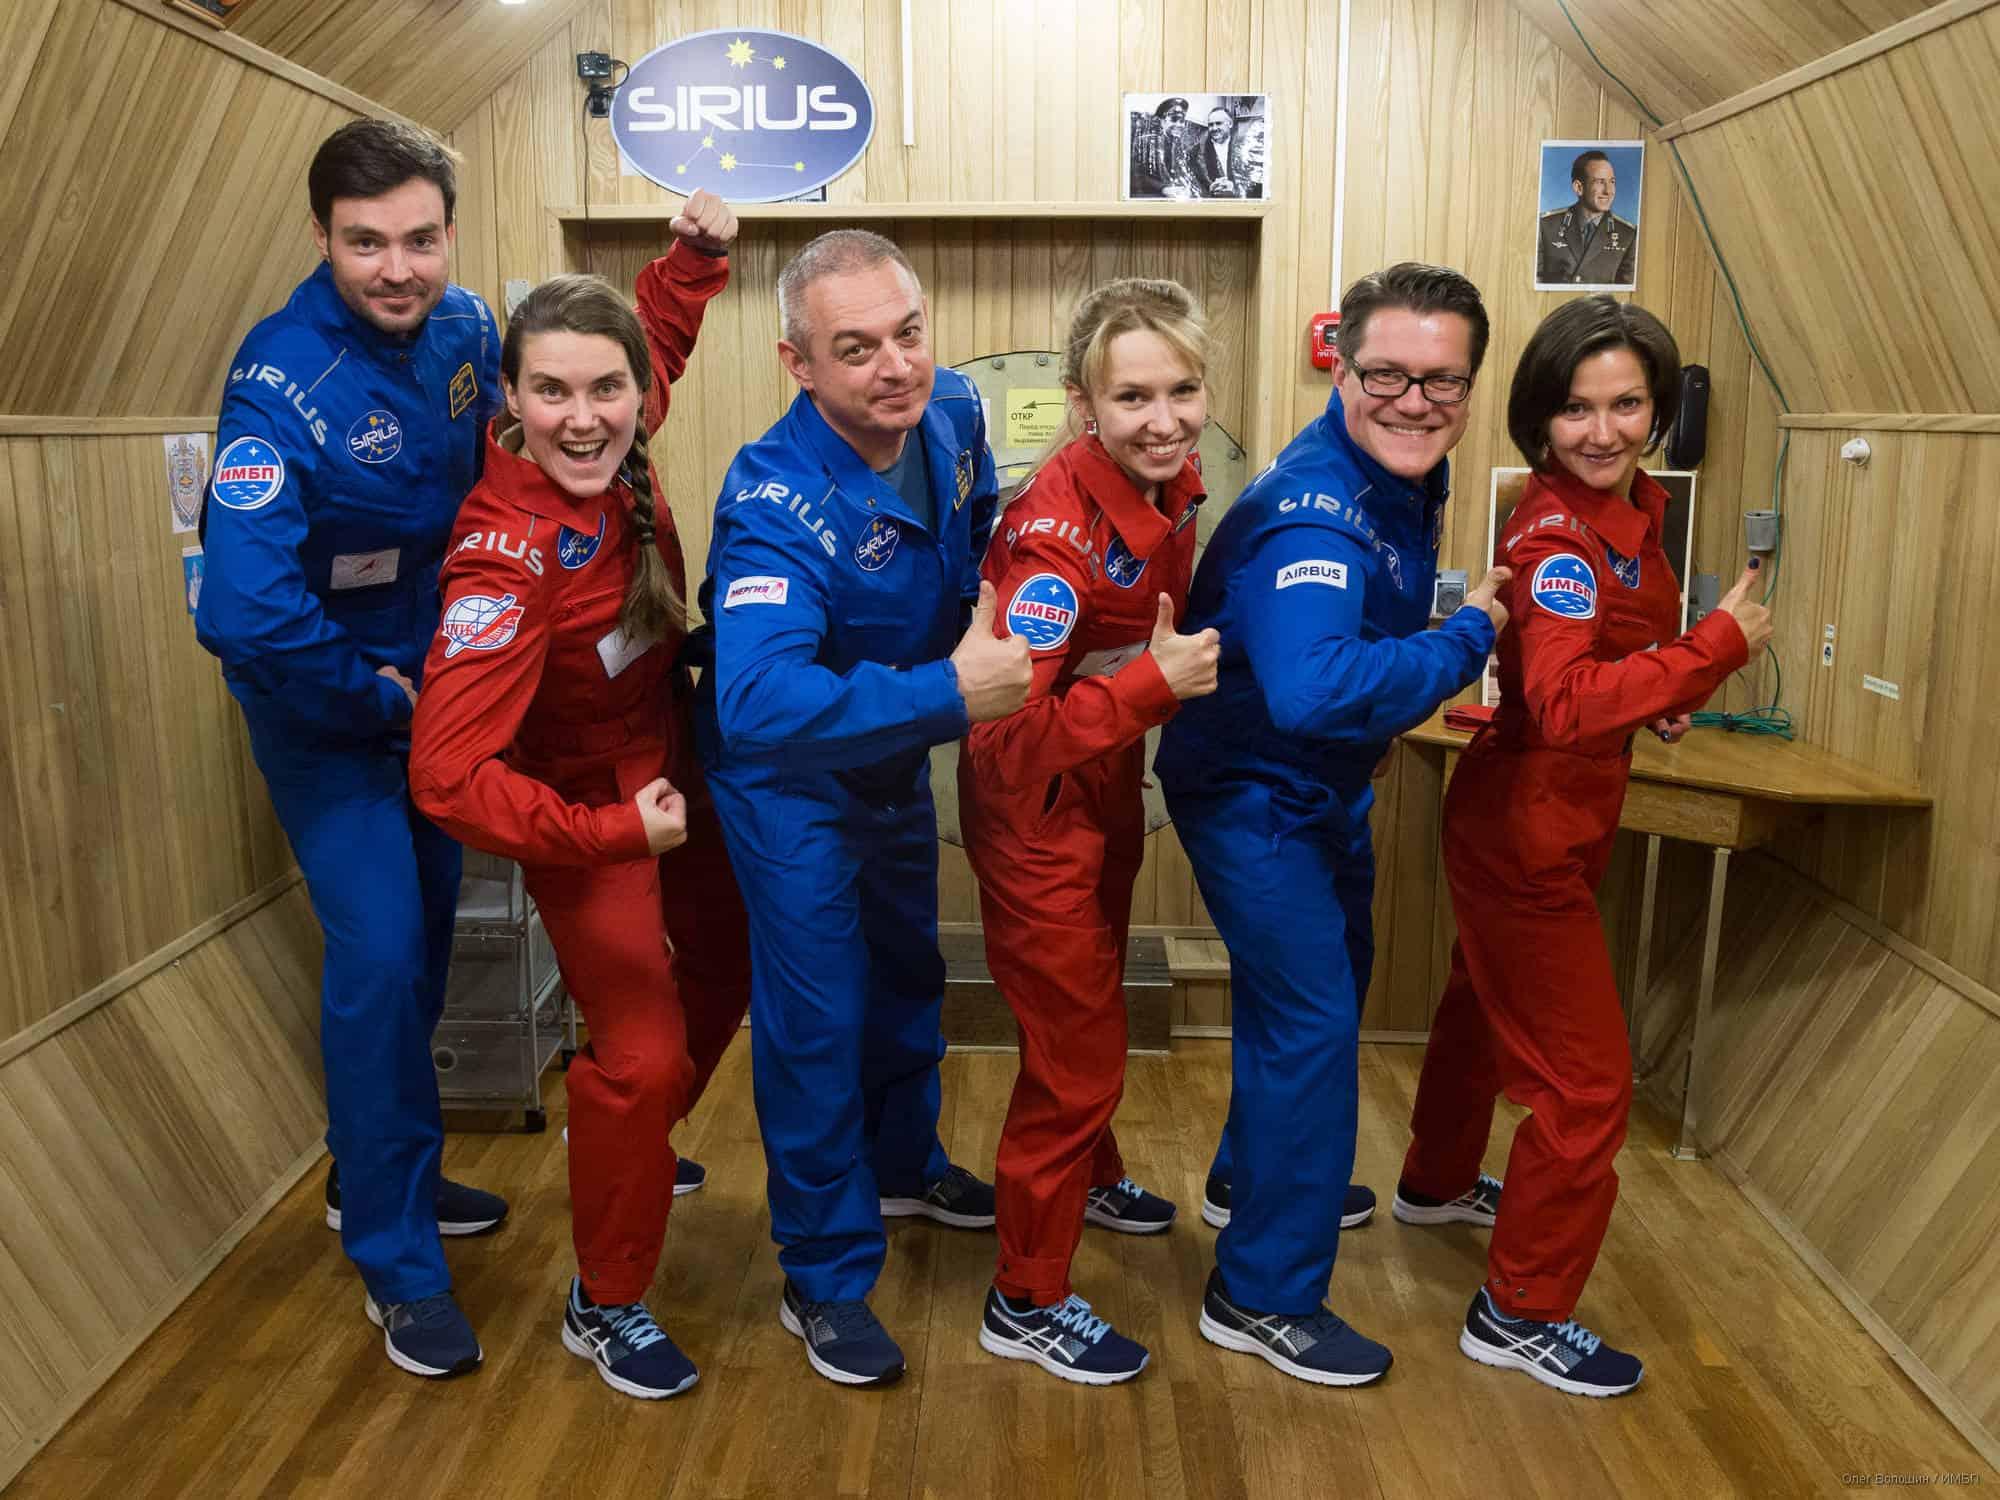 Экспедиция SIRIUS в Музее космонавтики Экспедиция SIRIUS в Музее космонавтики A94O5013